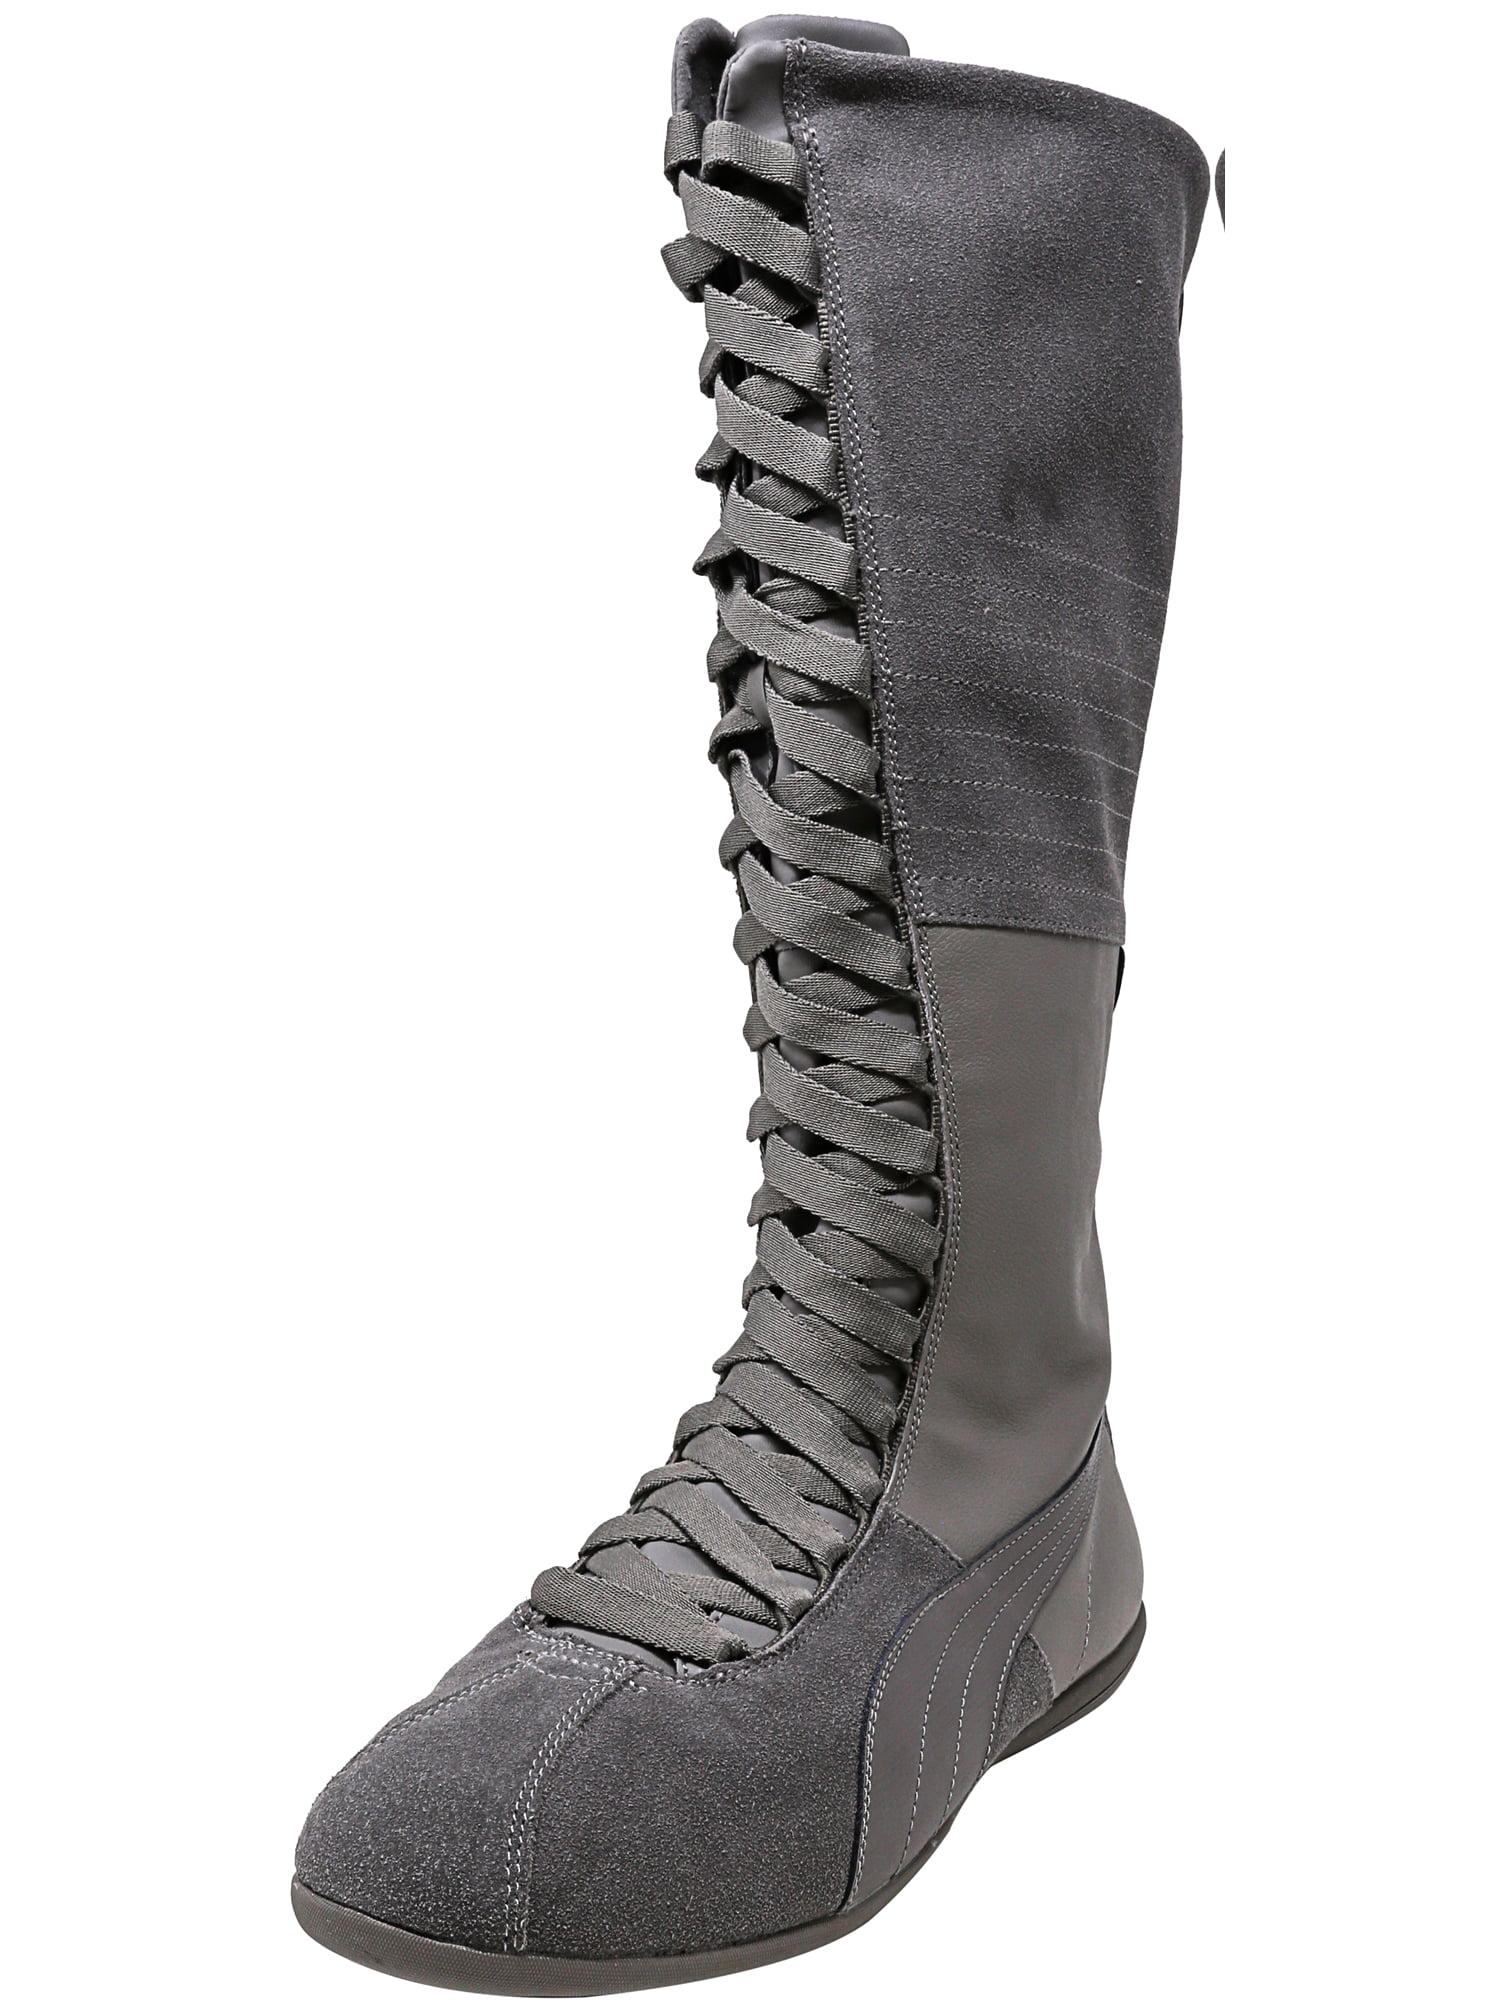 Puma Women's Eskiva Very Hi Steel Gray